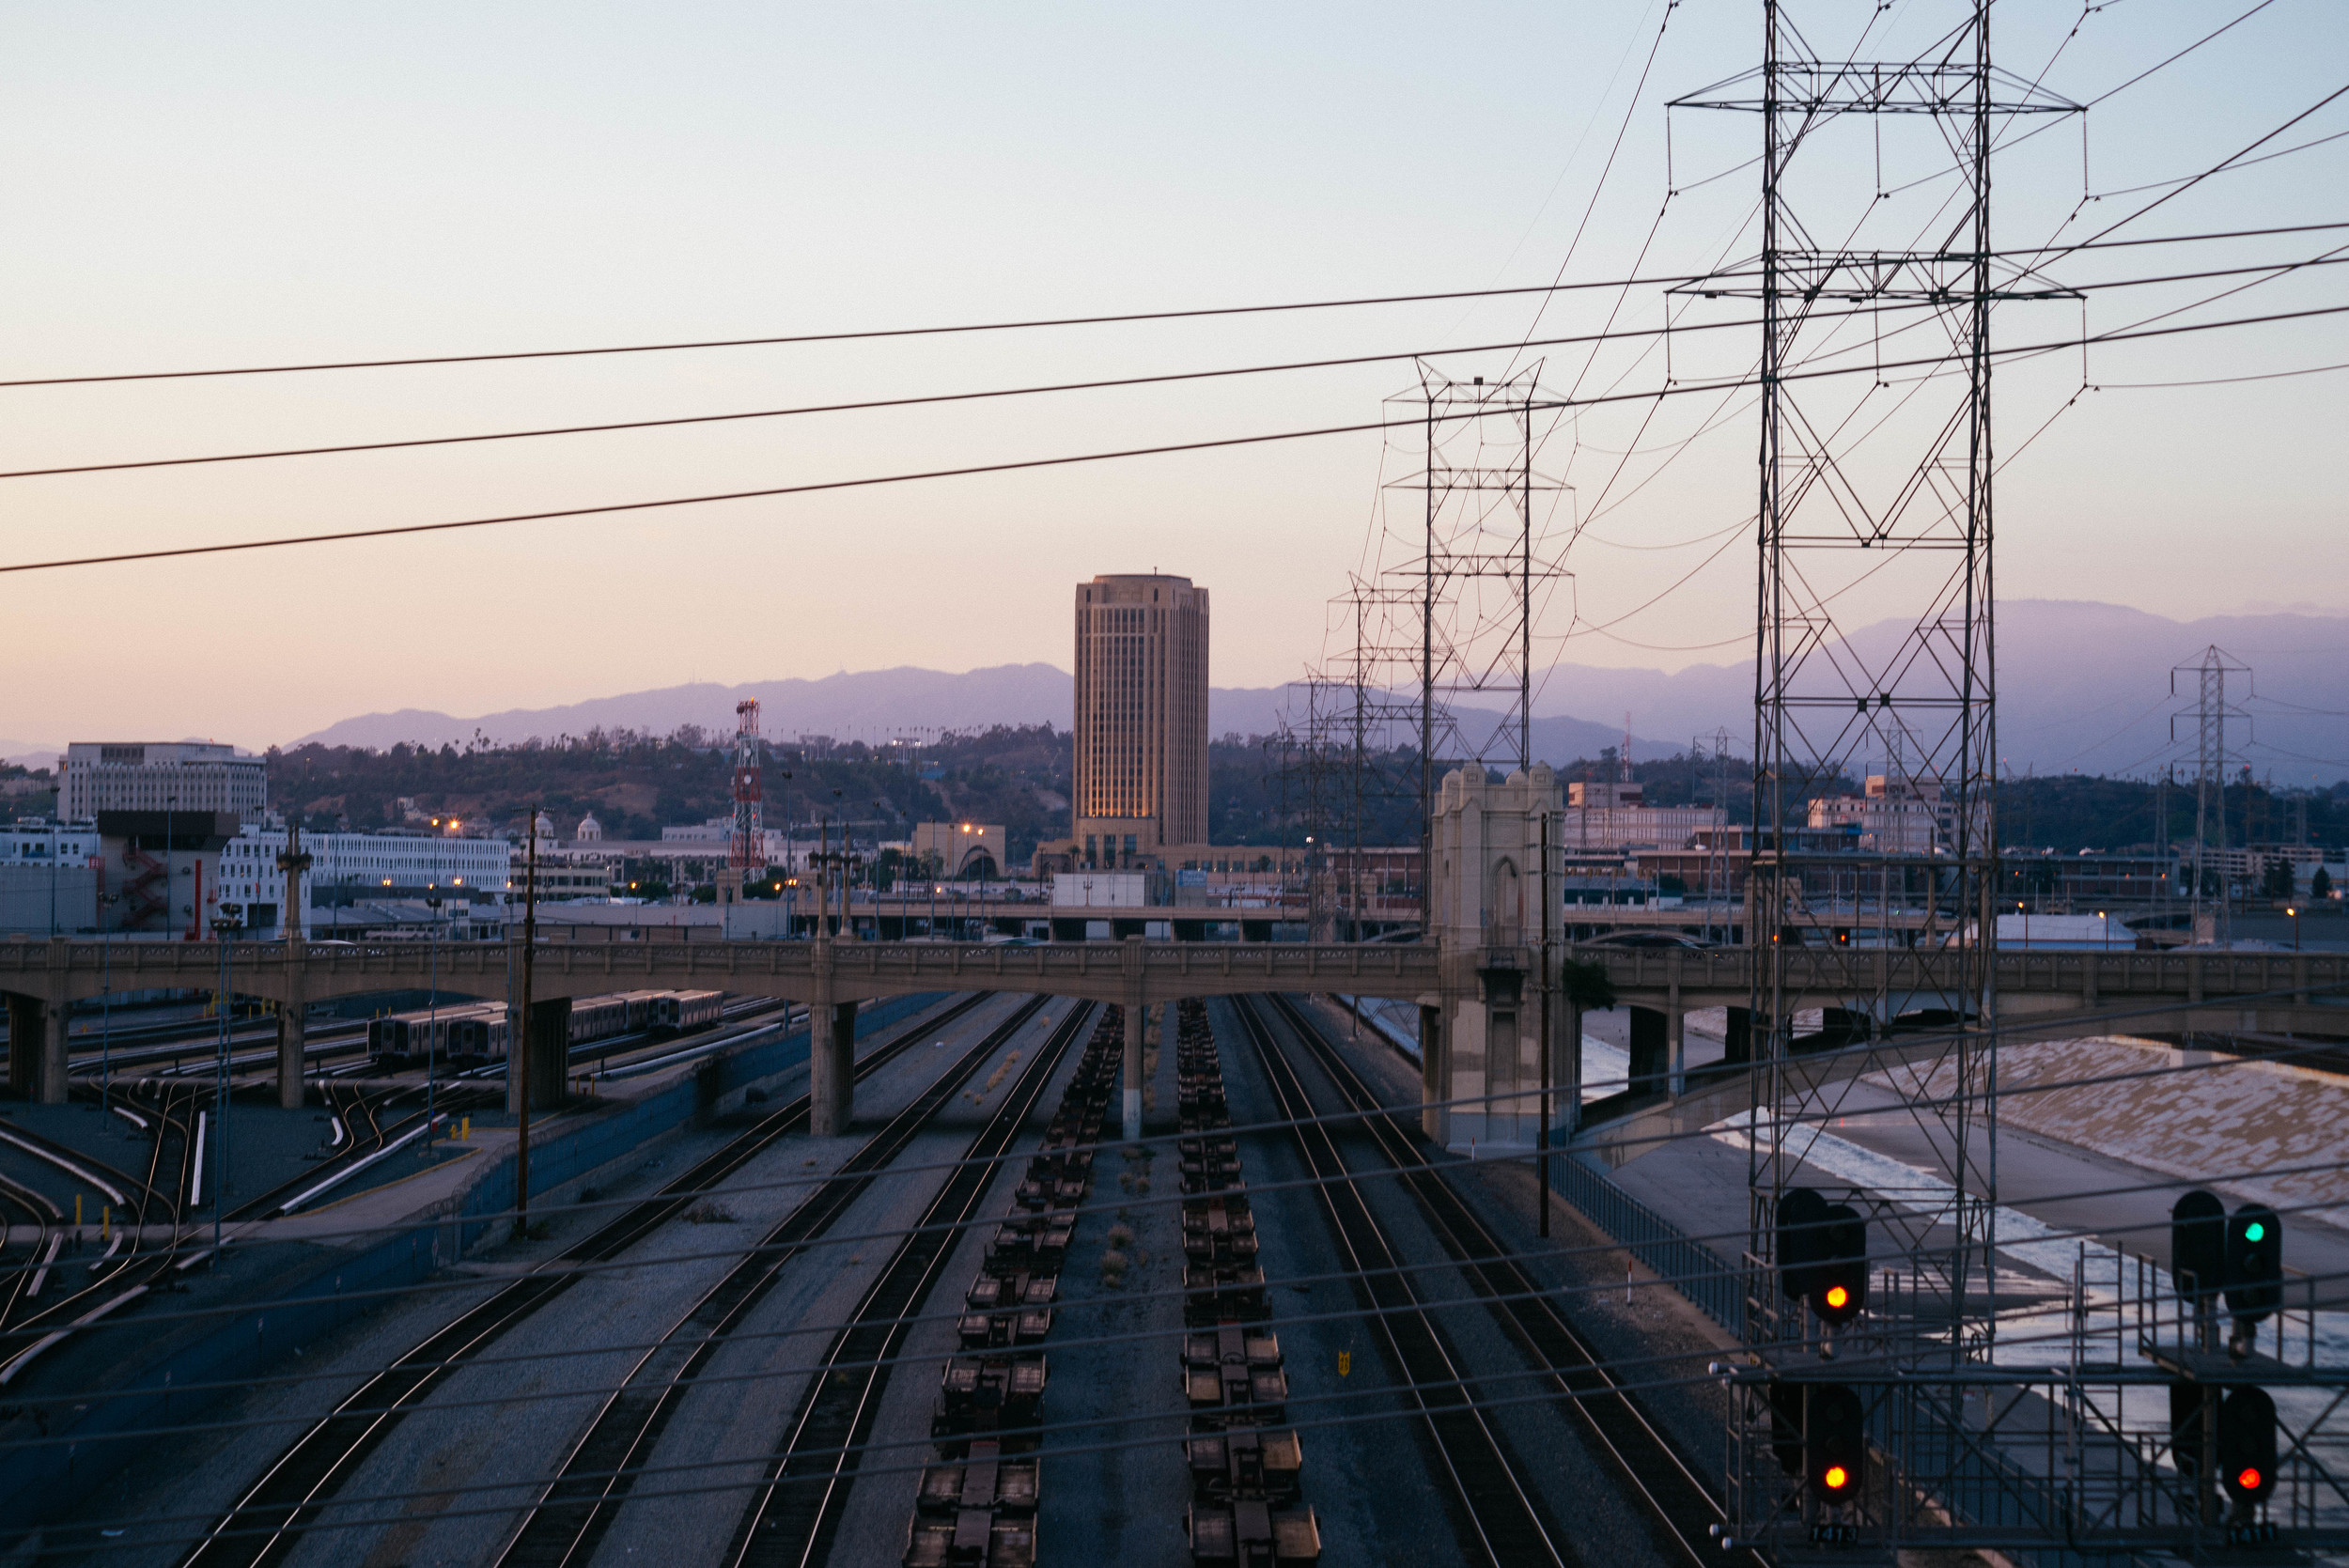 Layered Los Angeles #2